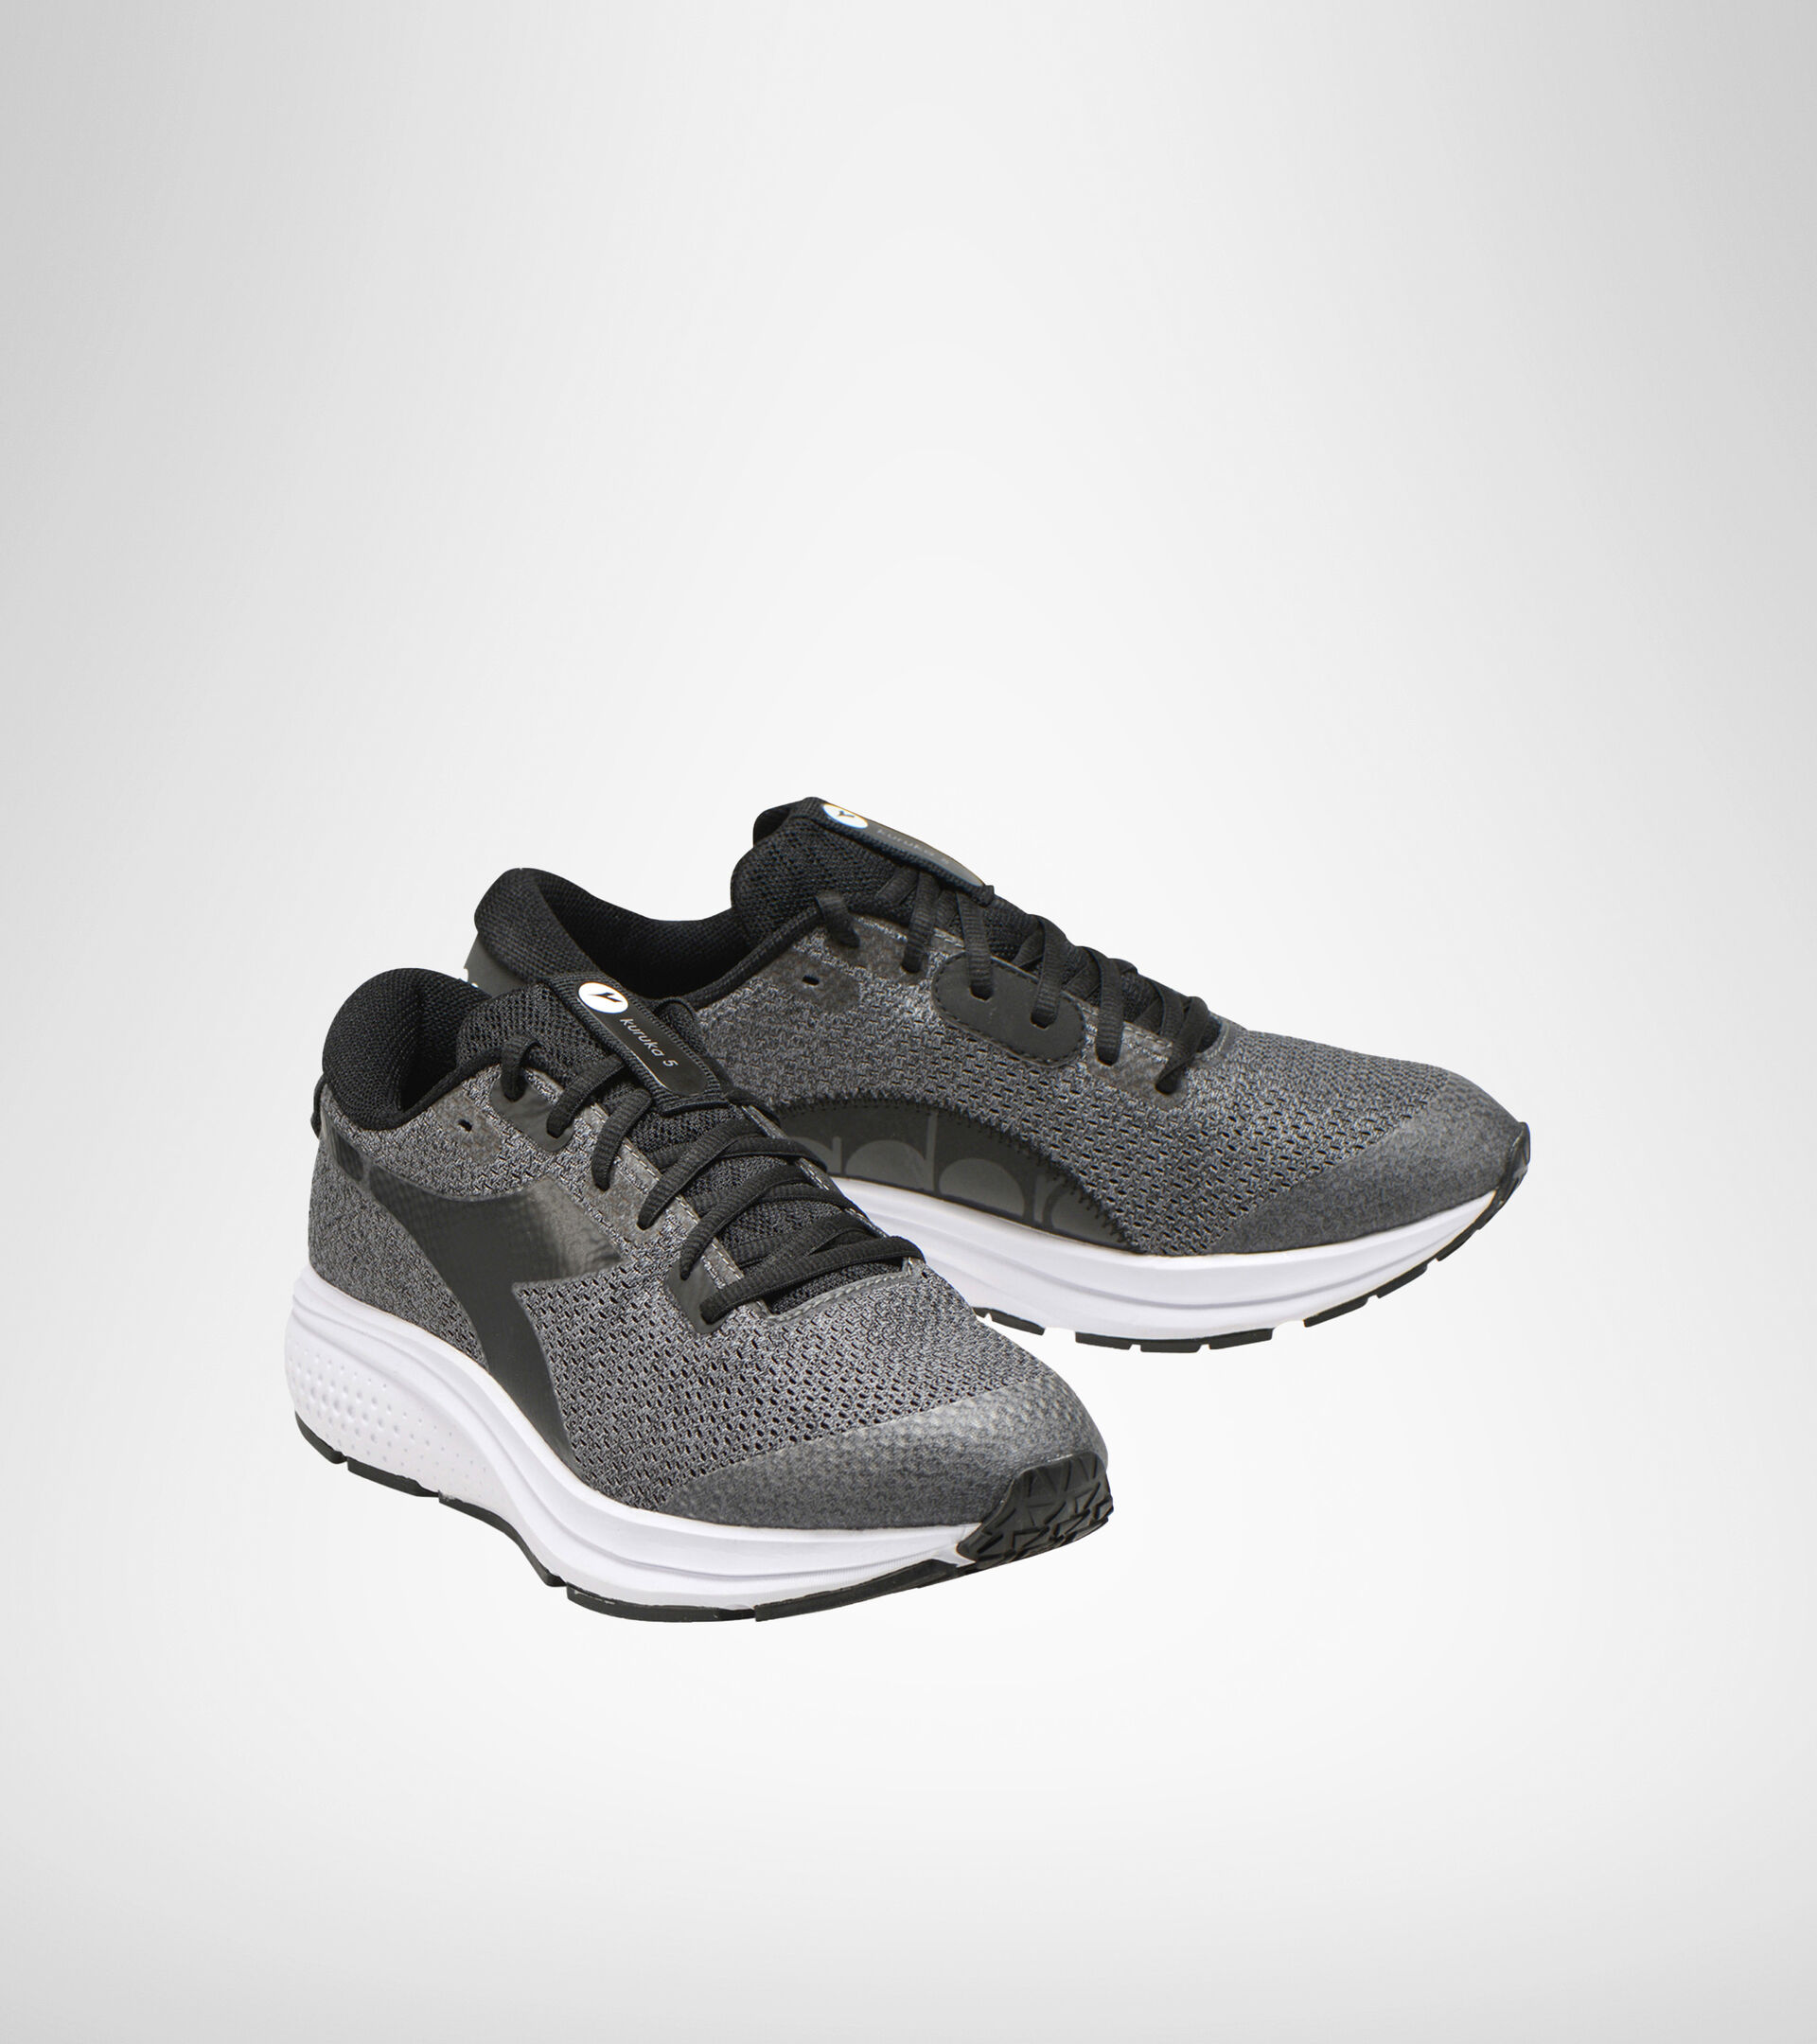 Footwear Sport UOMO KURUKA 5 BLACK/WHITE (C7406) Diadora